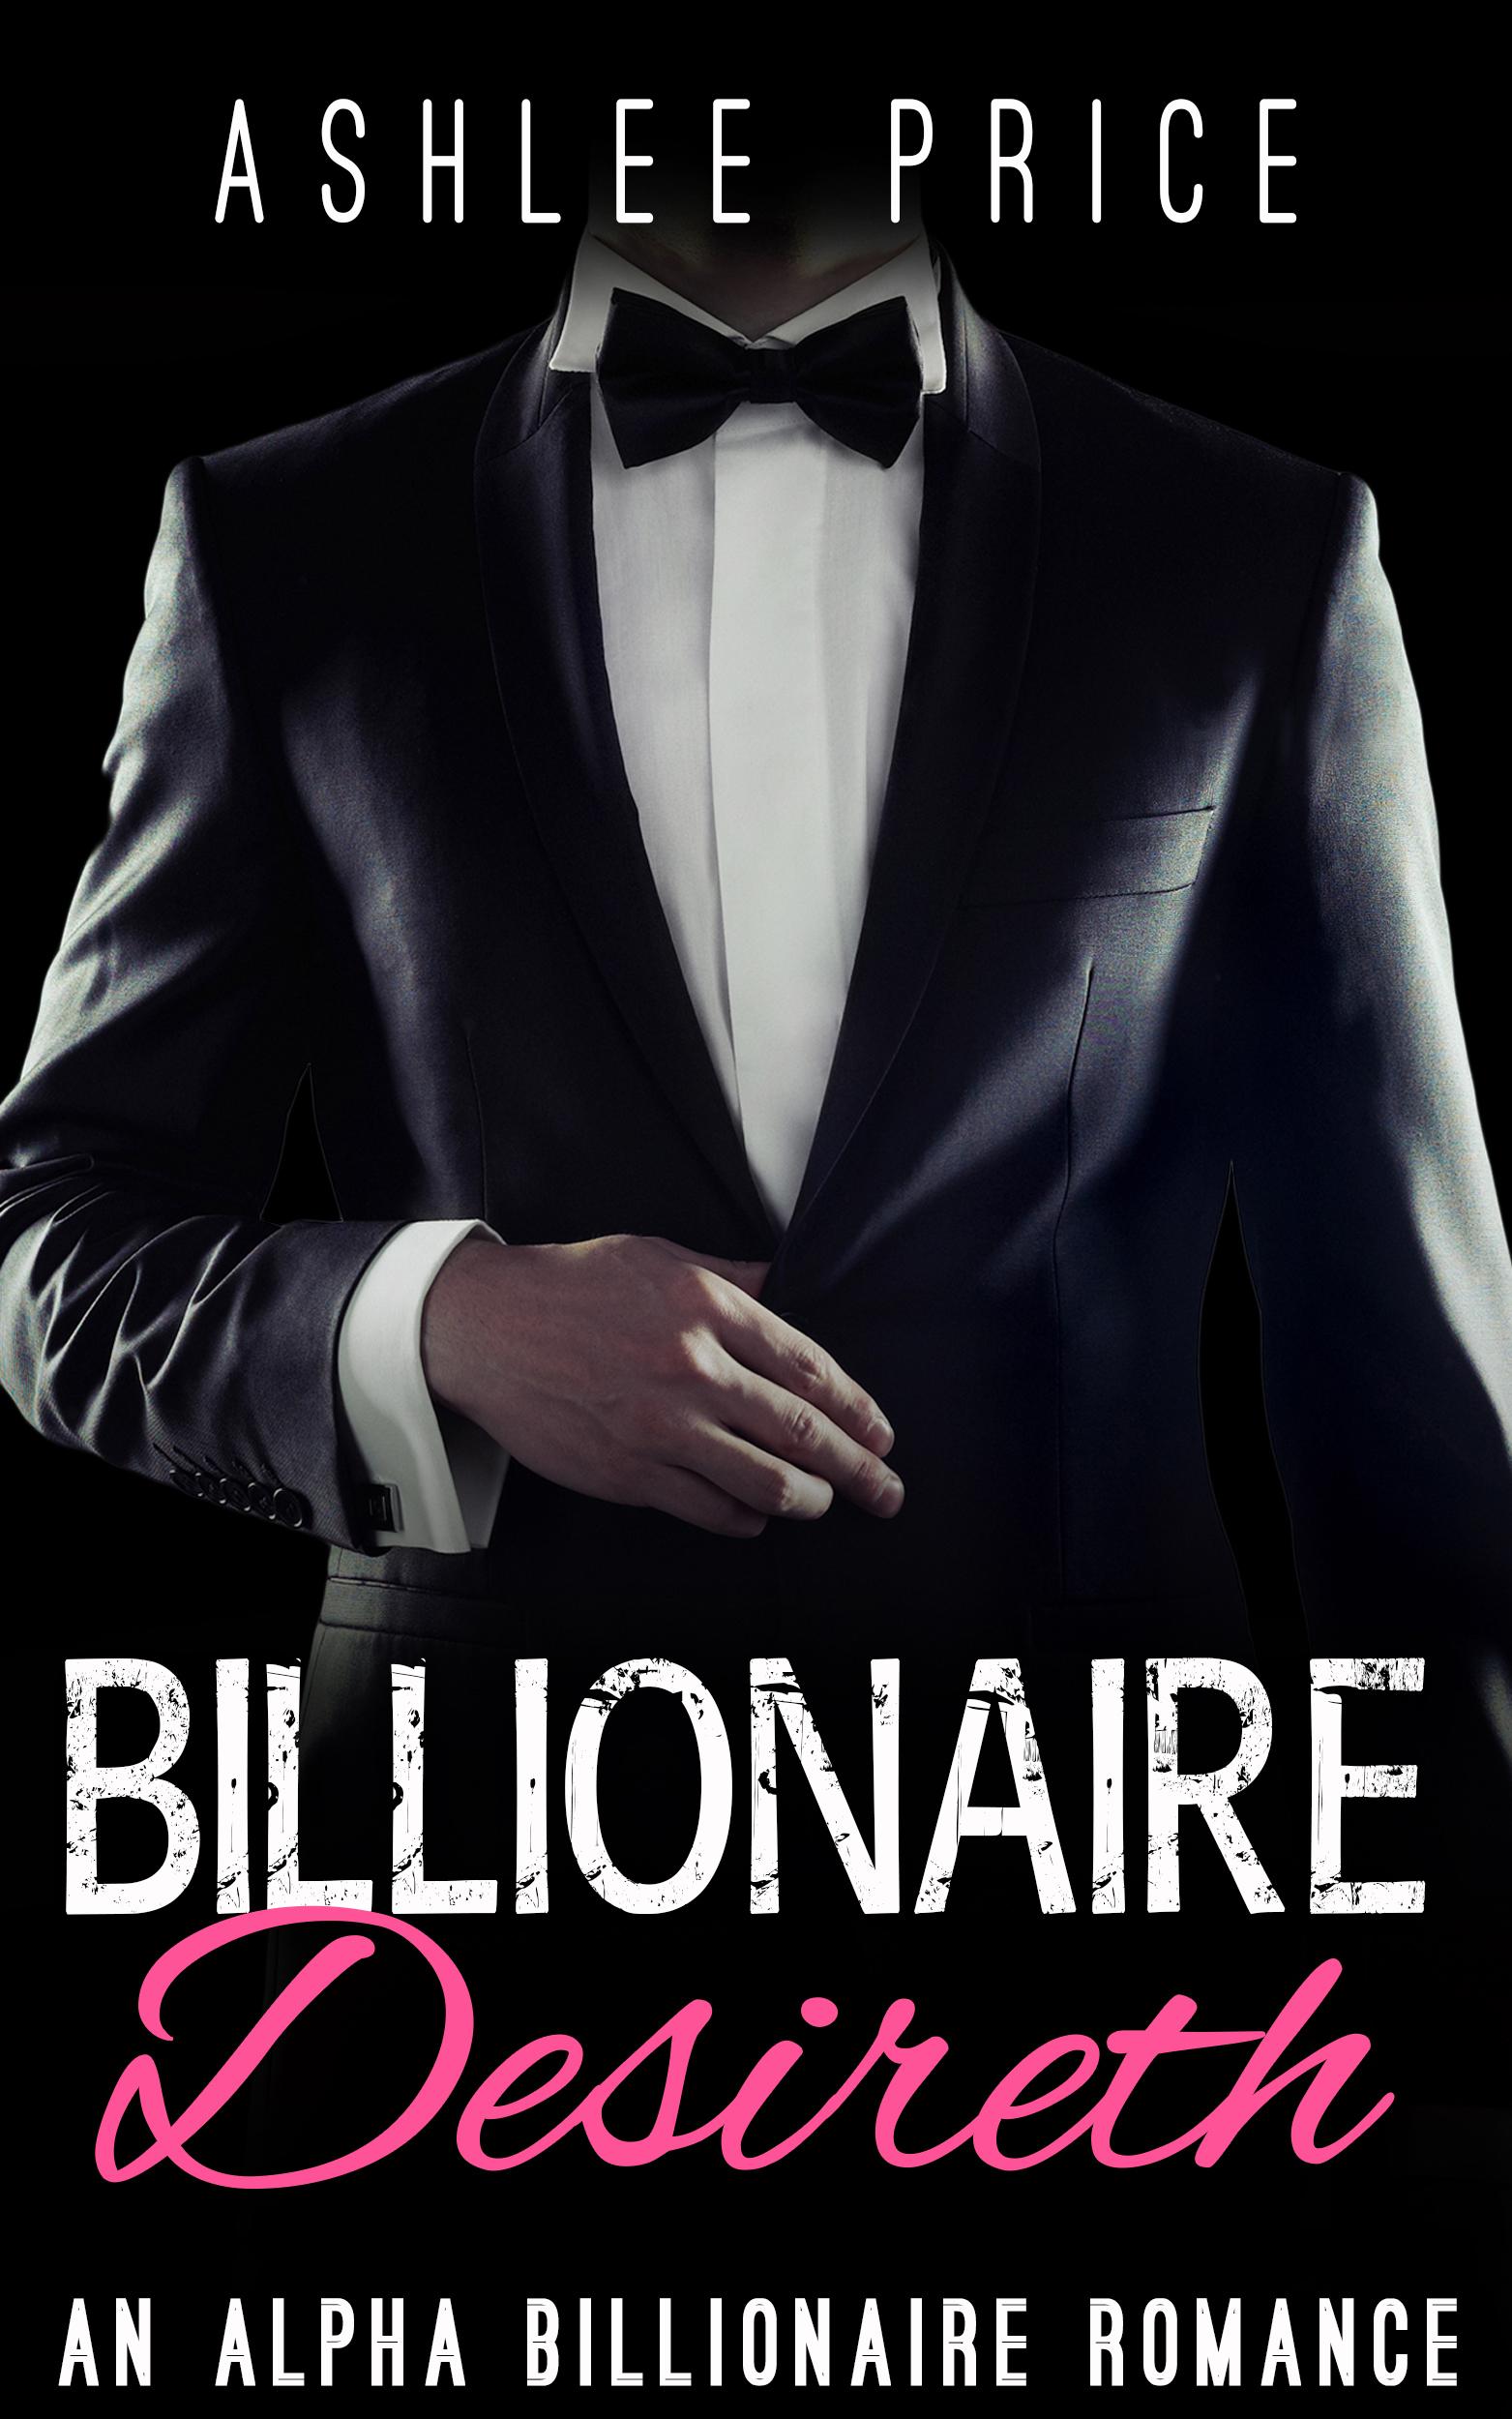 Billionaire Desireth.jpg